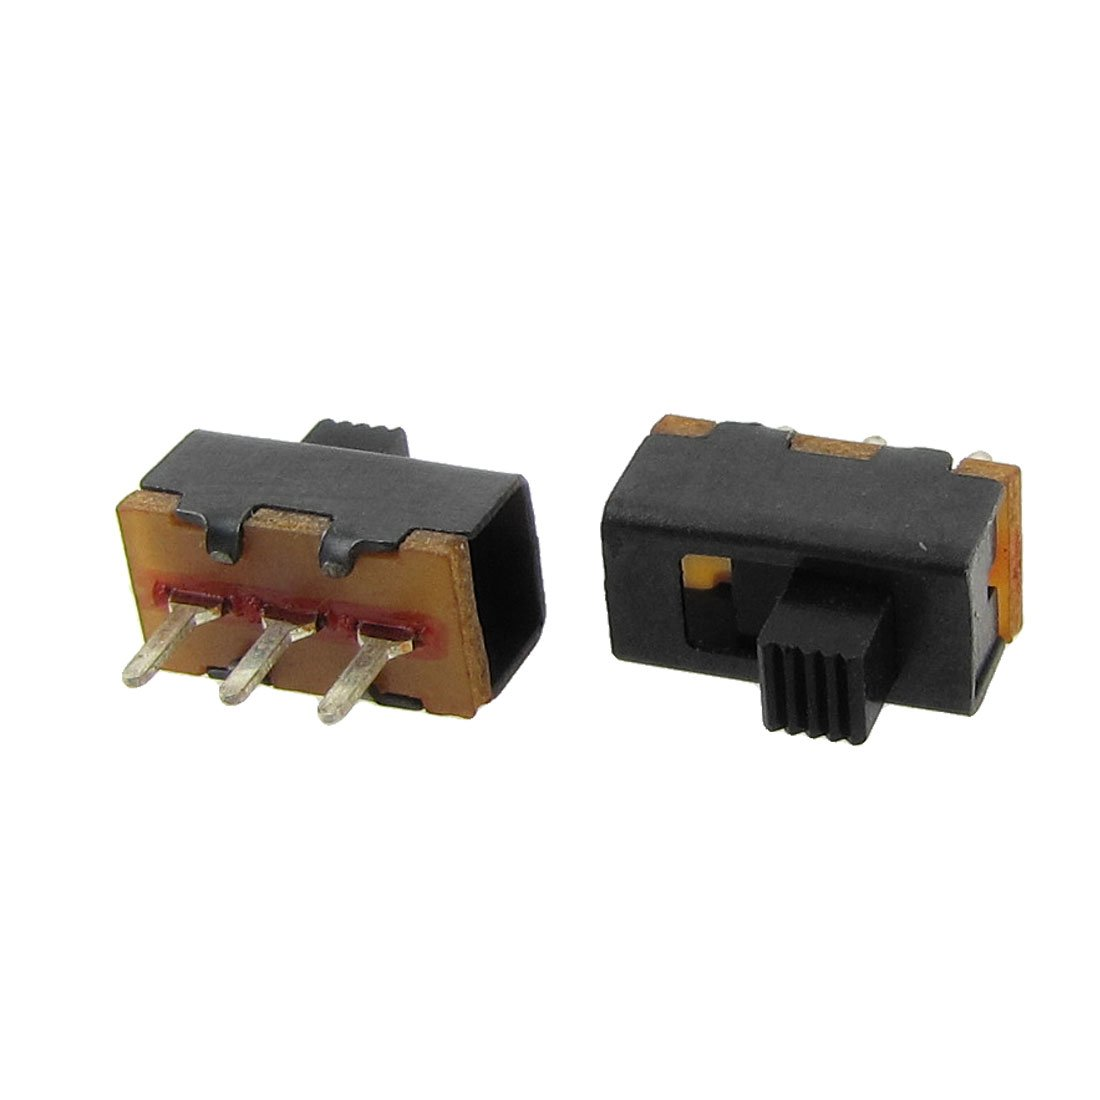 50V DC Uxcell a12013100ux0111 High Knob 2 Position 1P2T SPDT Vertical Slide Switch 50 Piece 3 mm 0.5 Amp